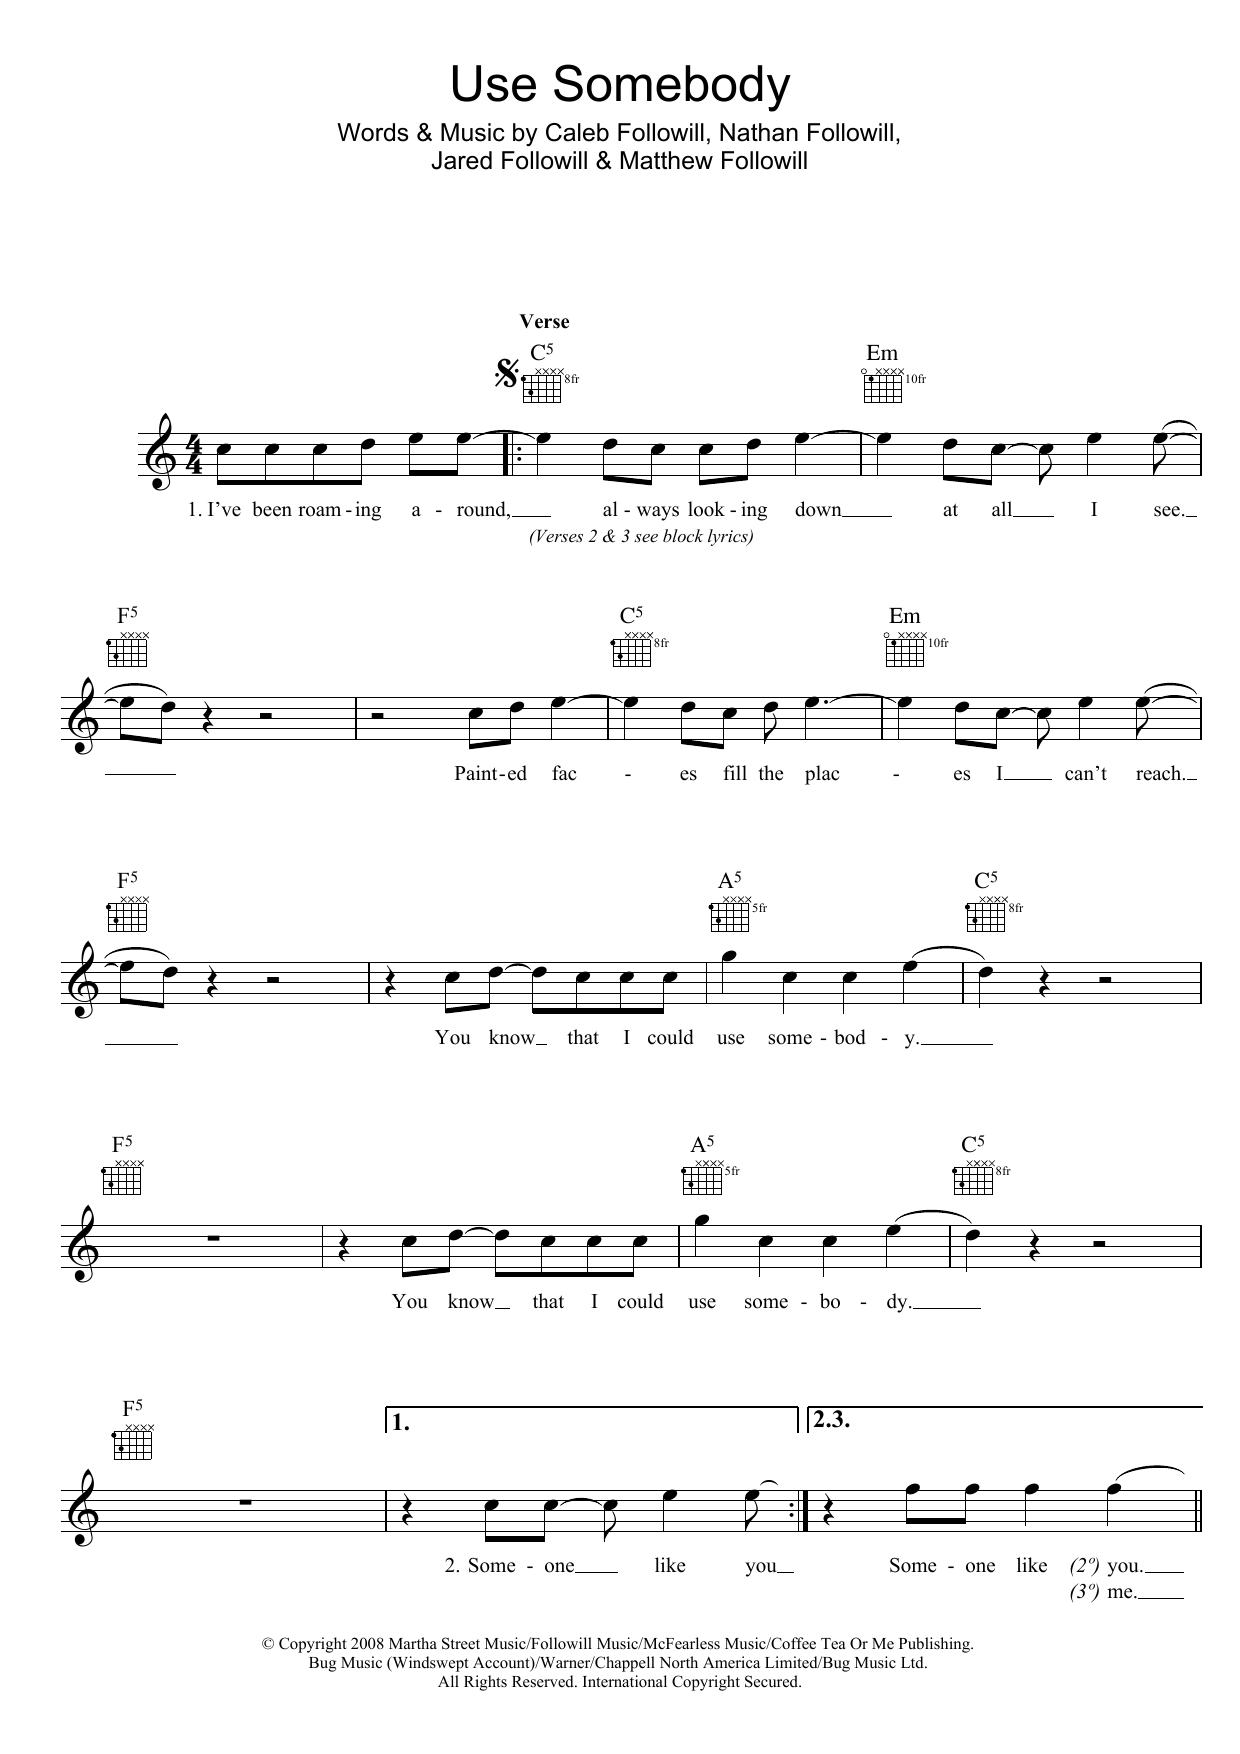 Use Somebody Sheet Music Kings Of Leon Melody Line Lyrics Chords